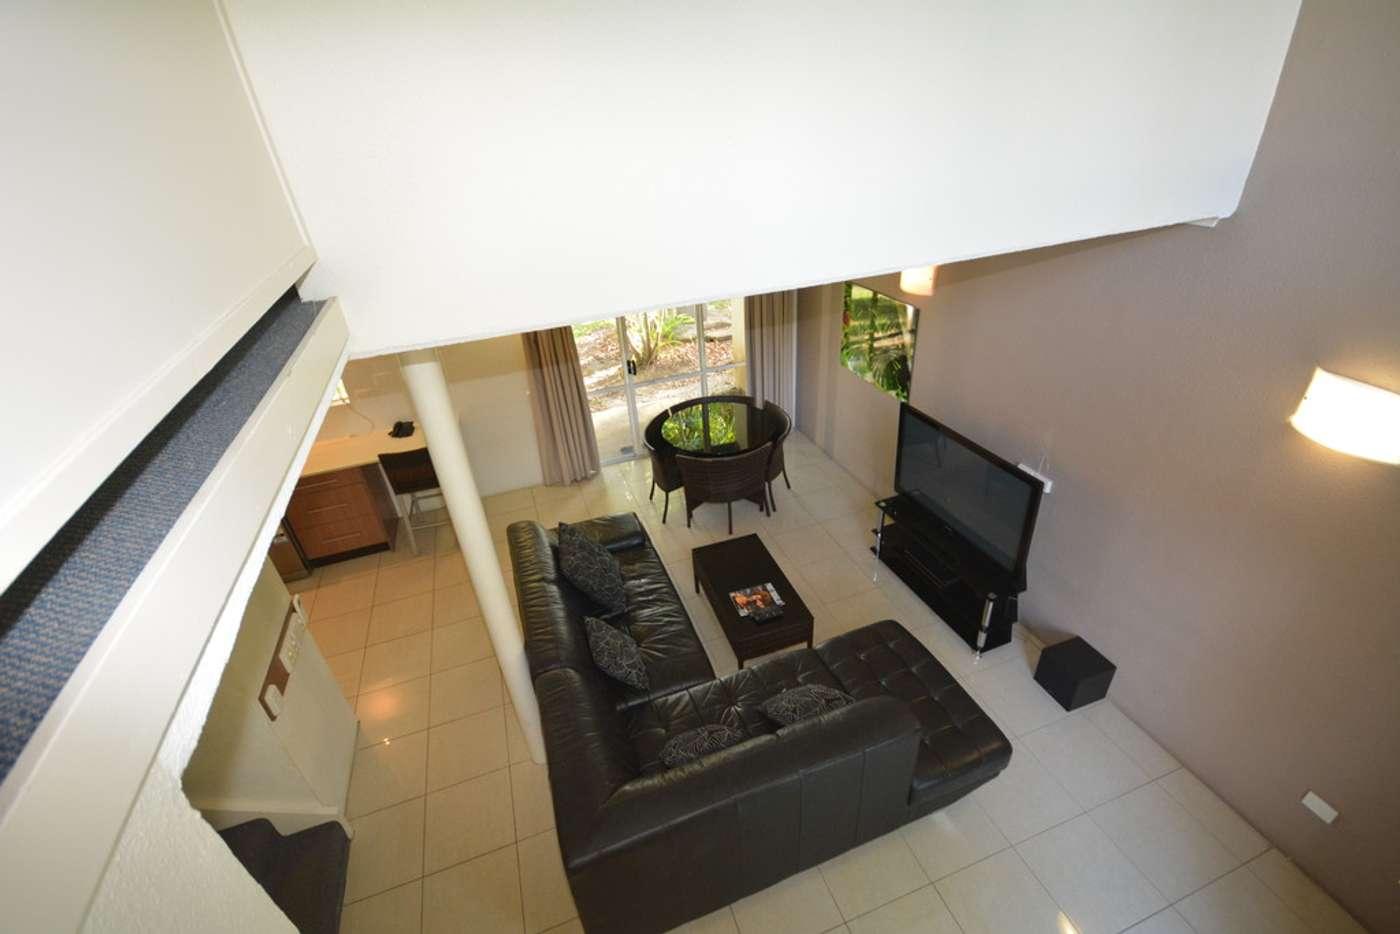 Sixth view of Homely unit listing, 14/121-137 Port Douglas Rd, Reef Resort, Port Douglas QLD 4877